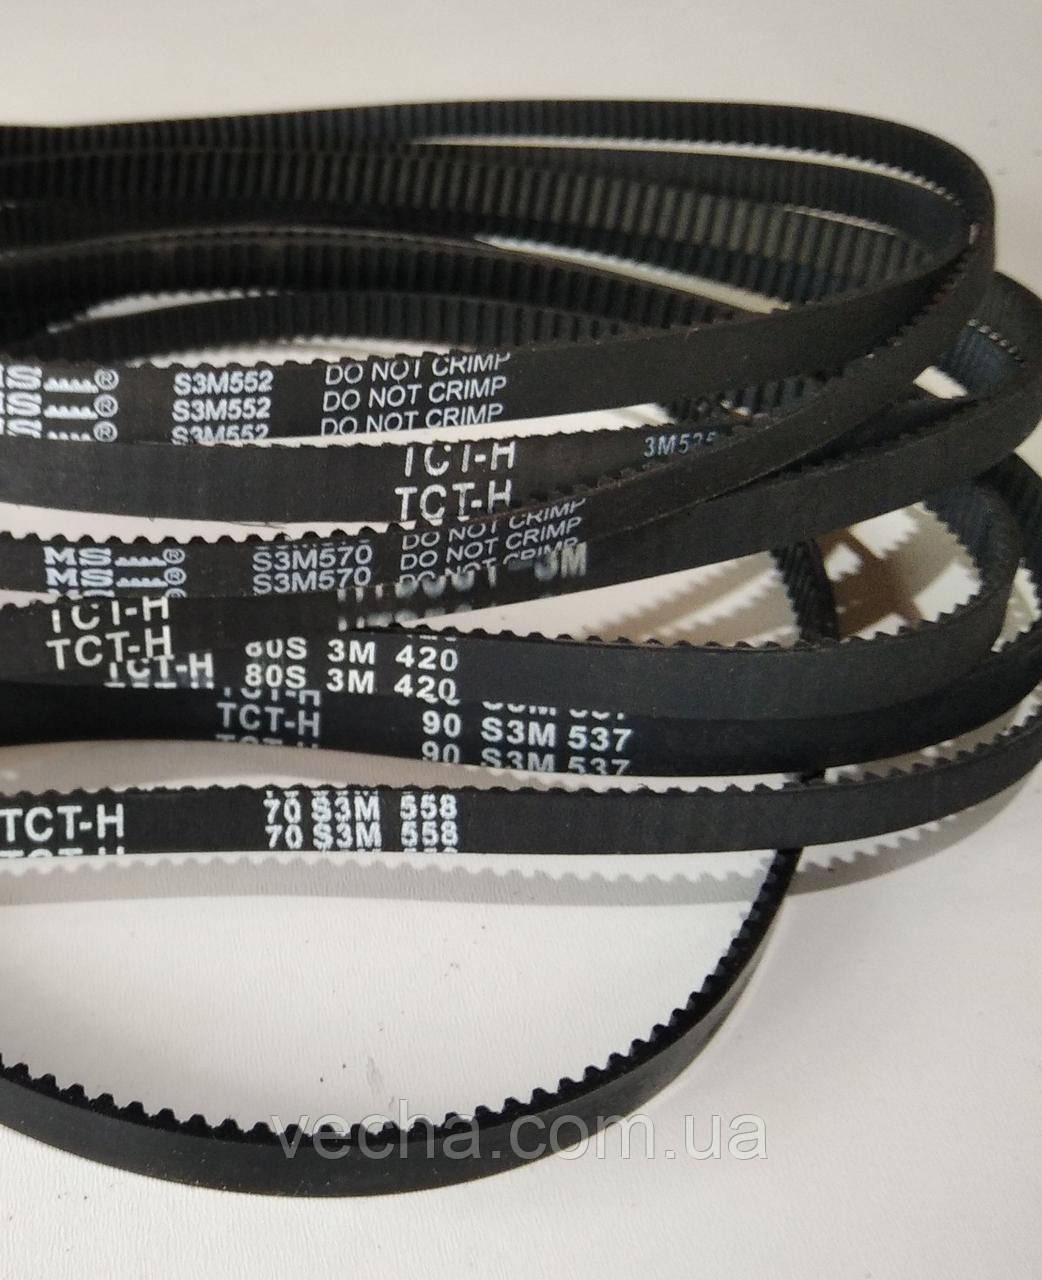 Ремень зубчатый S3М-420 для хлебопечки, фото 4